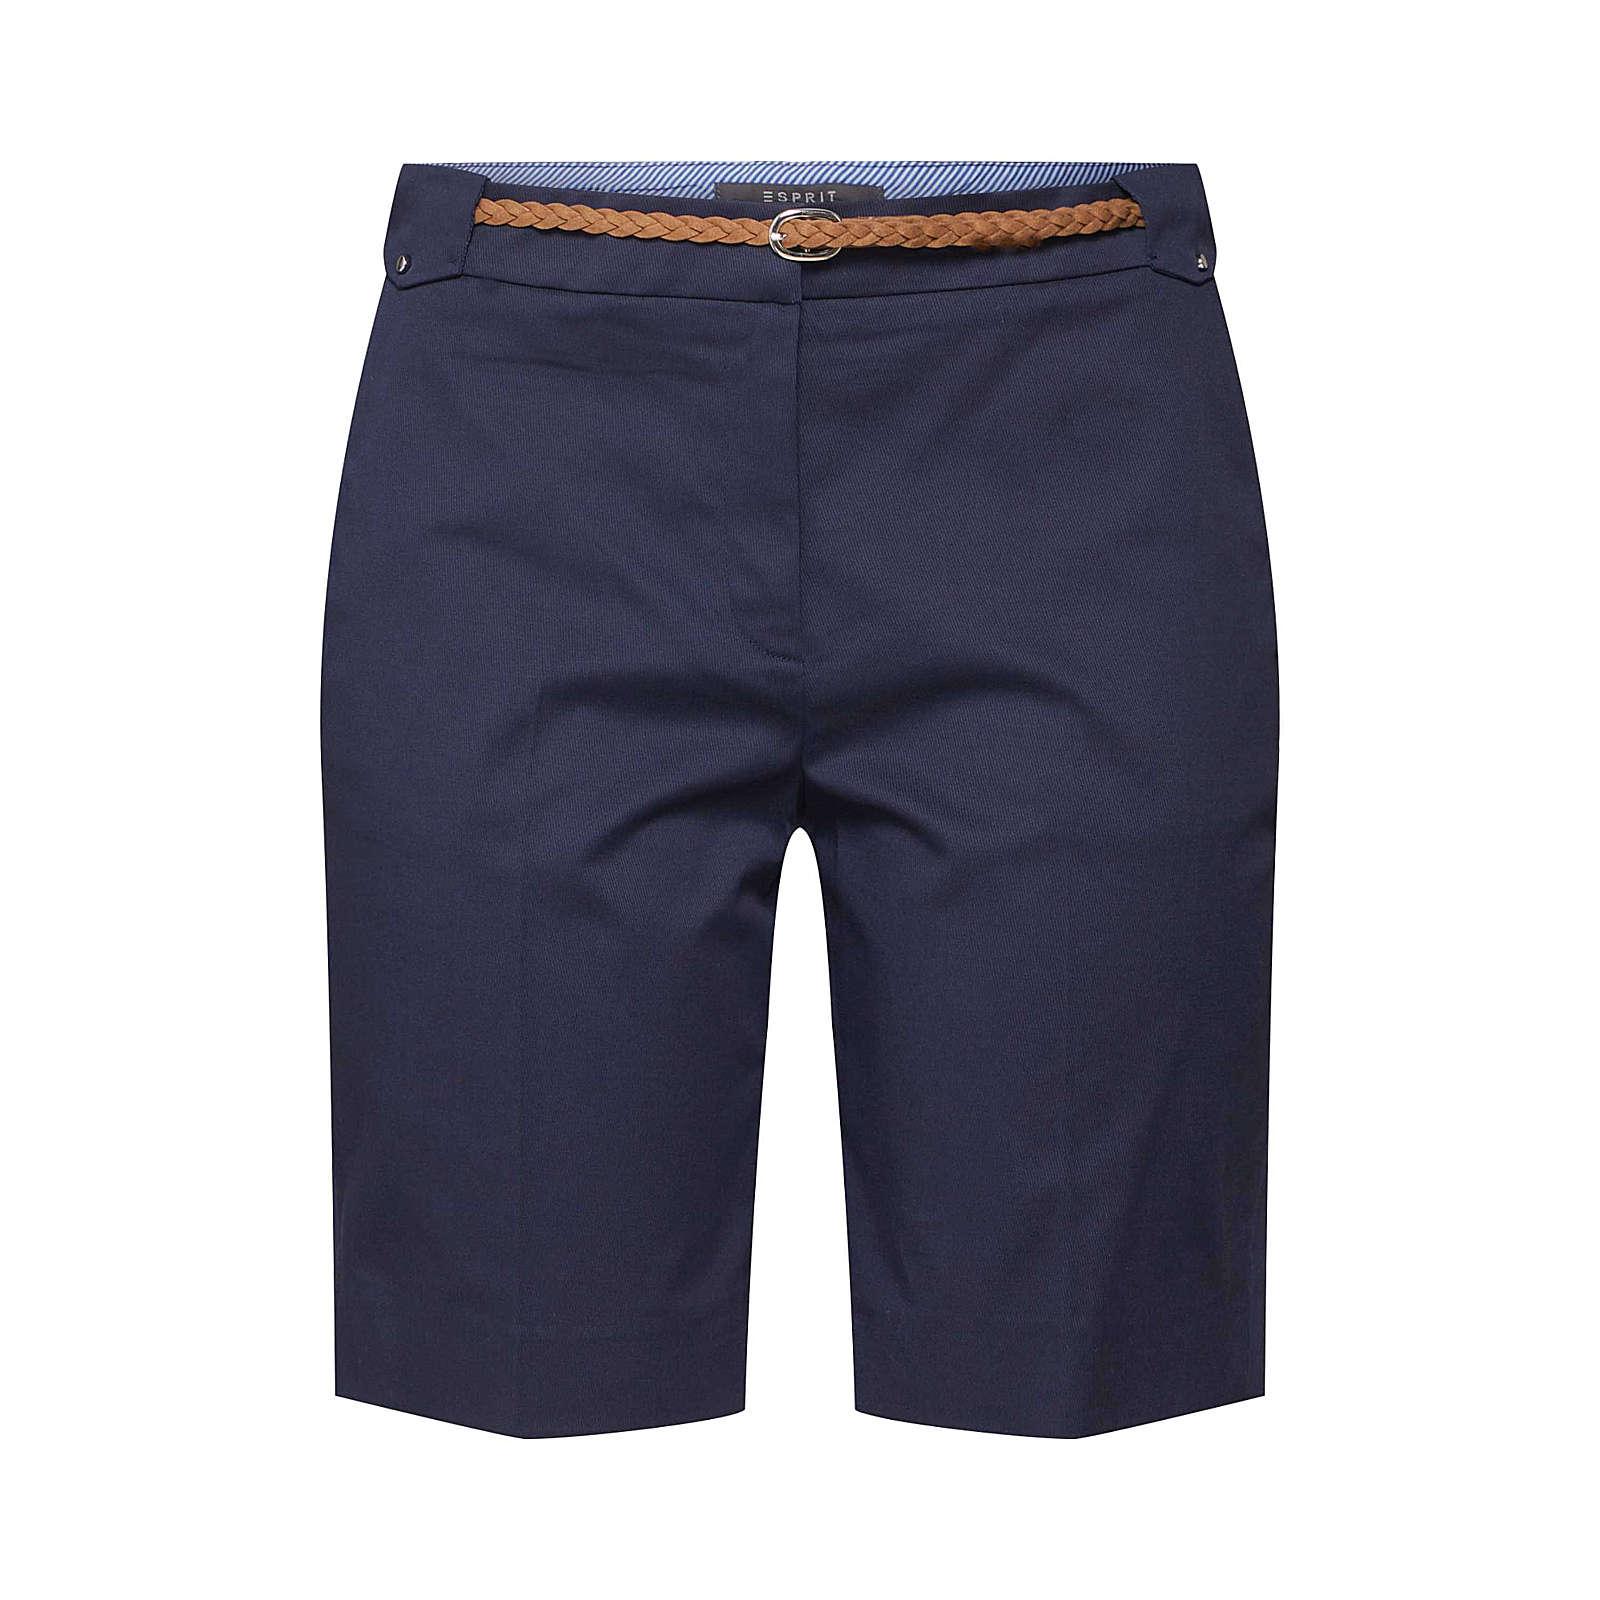 Esprit Collection Bügelfaltenhose Stoffhosen blau Damen Gr. 40